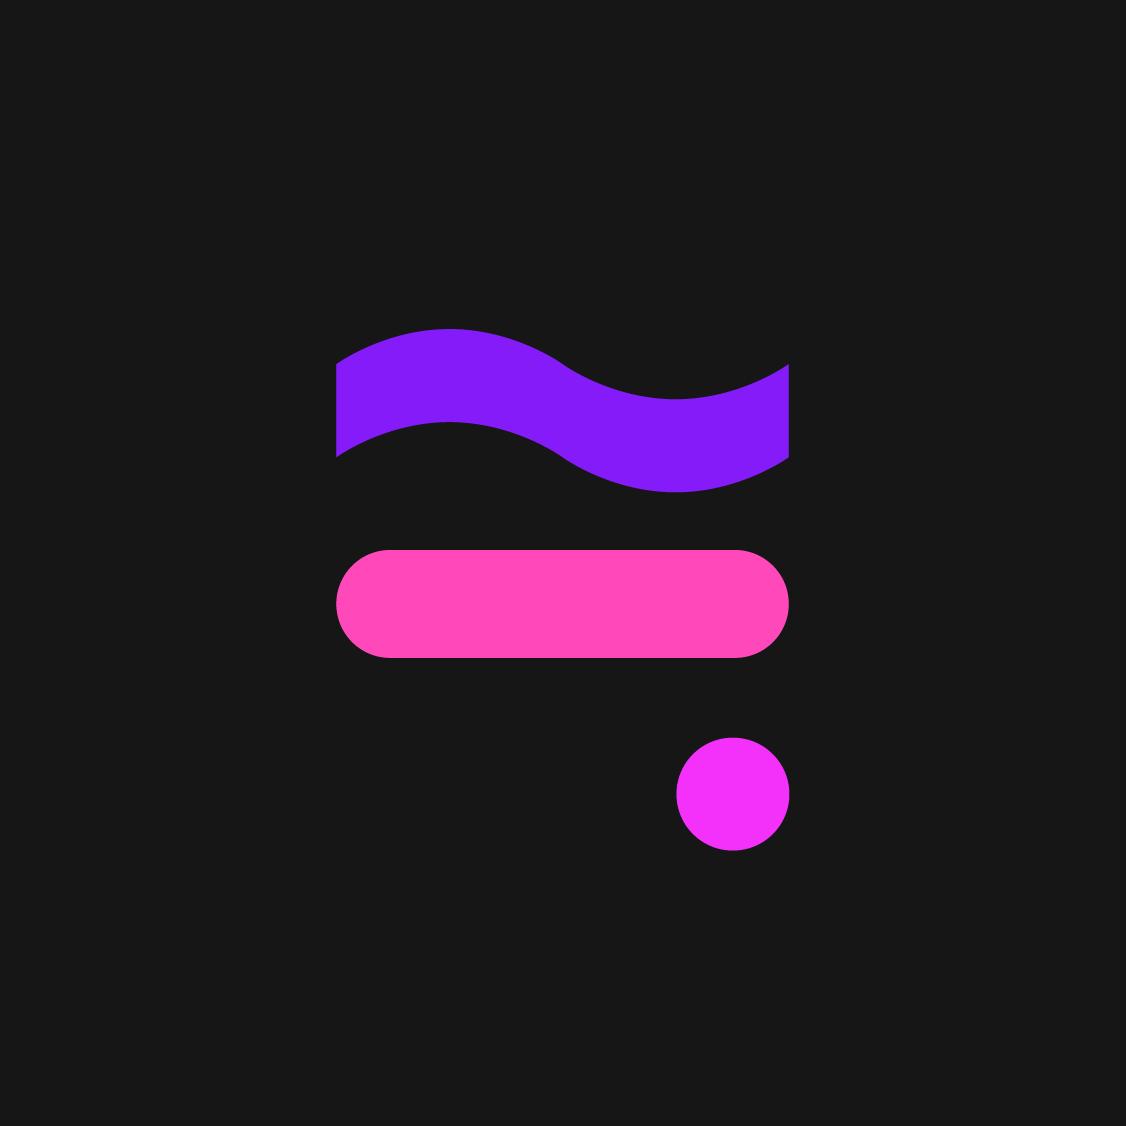 all-logos-2020-10